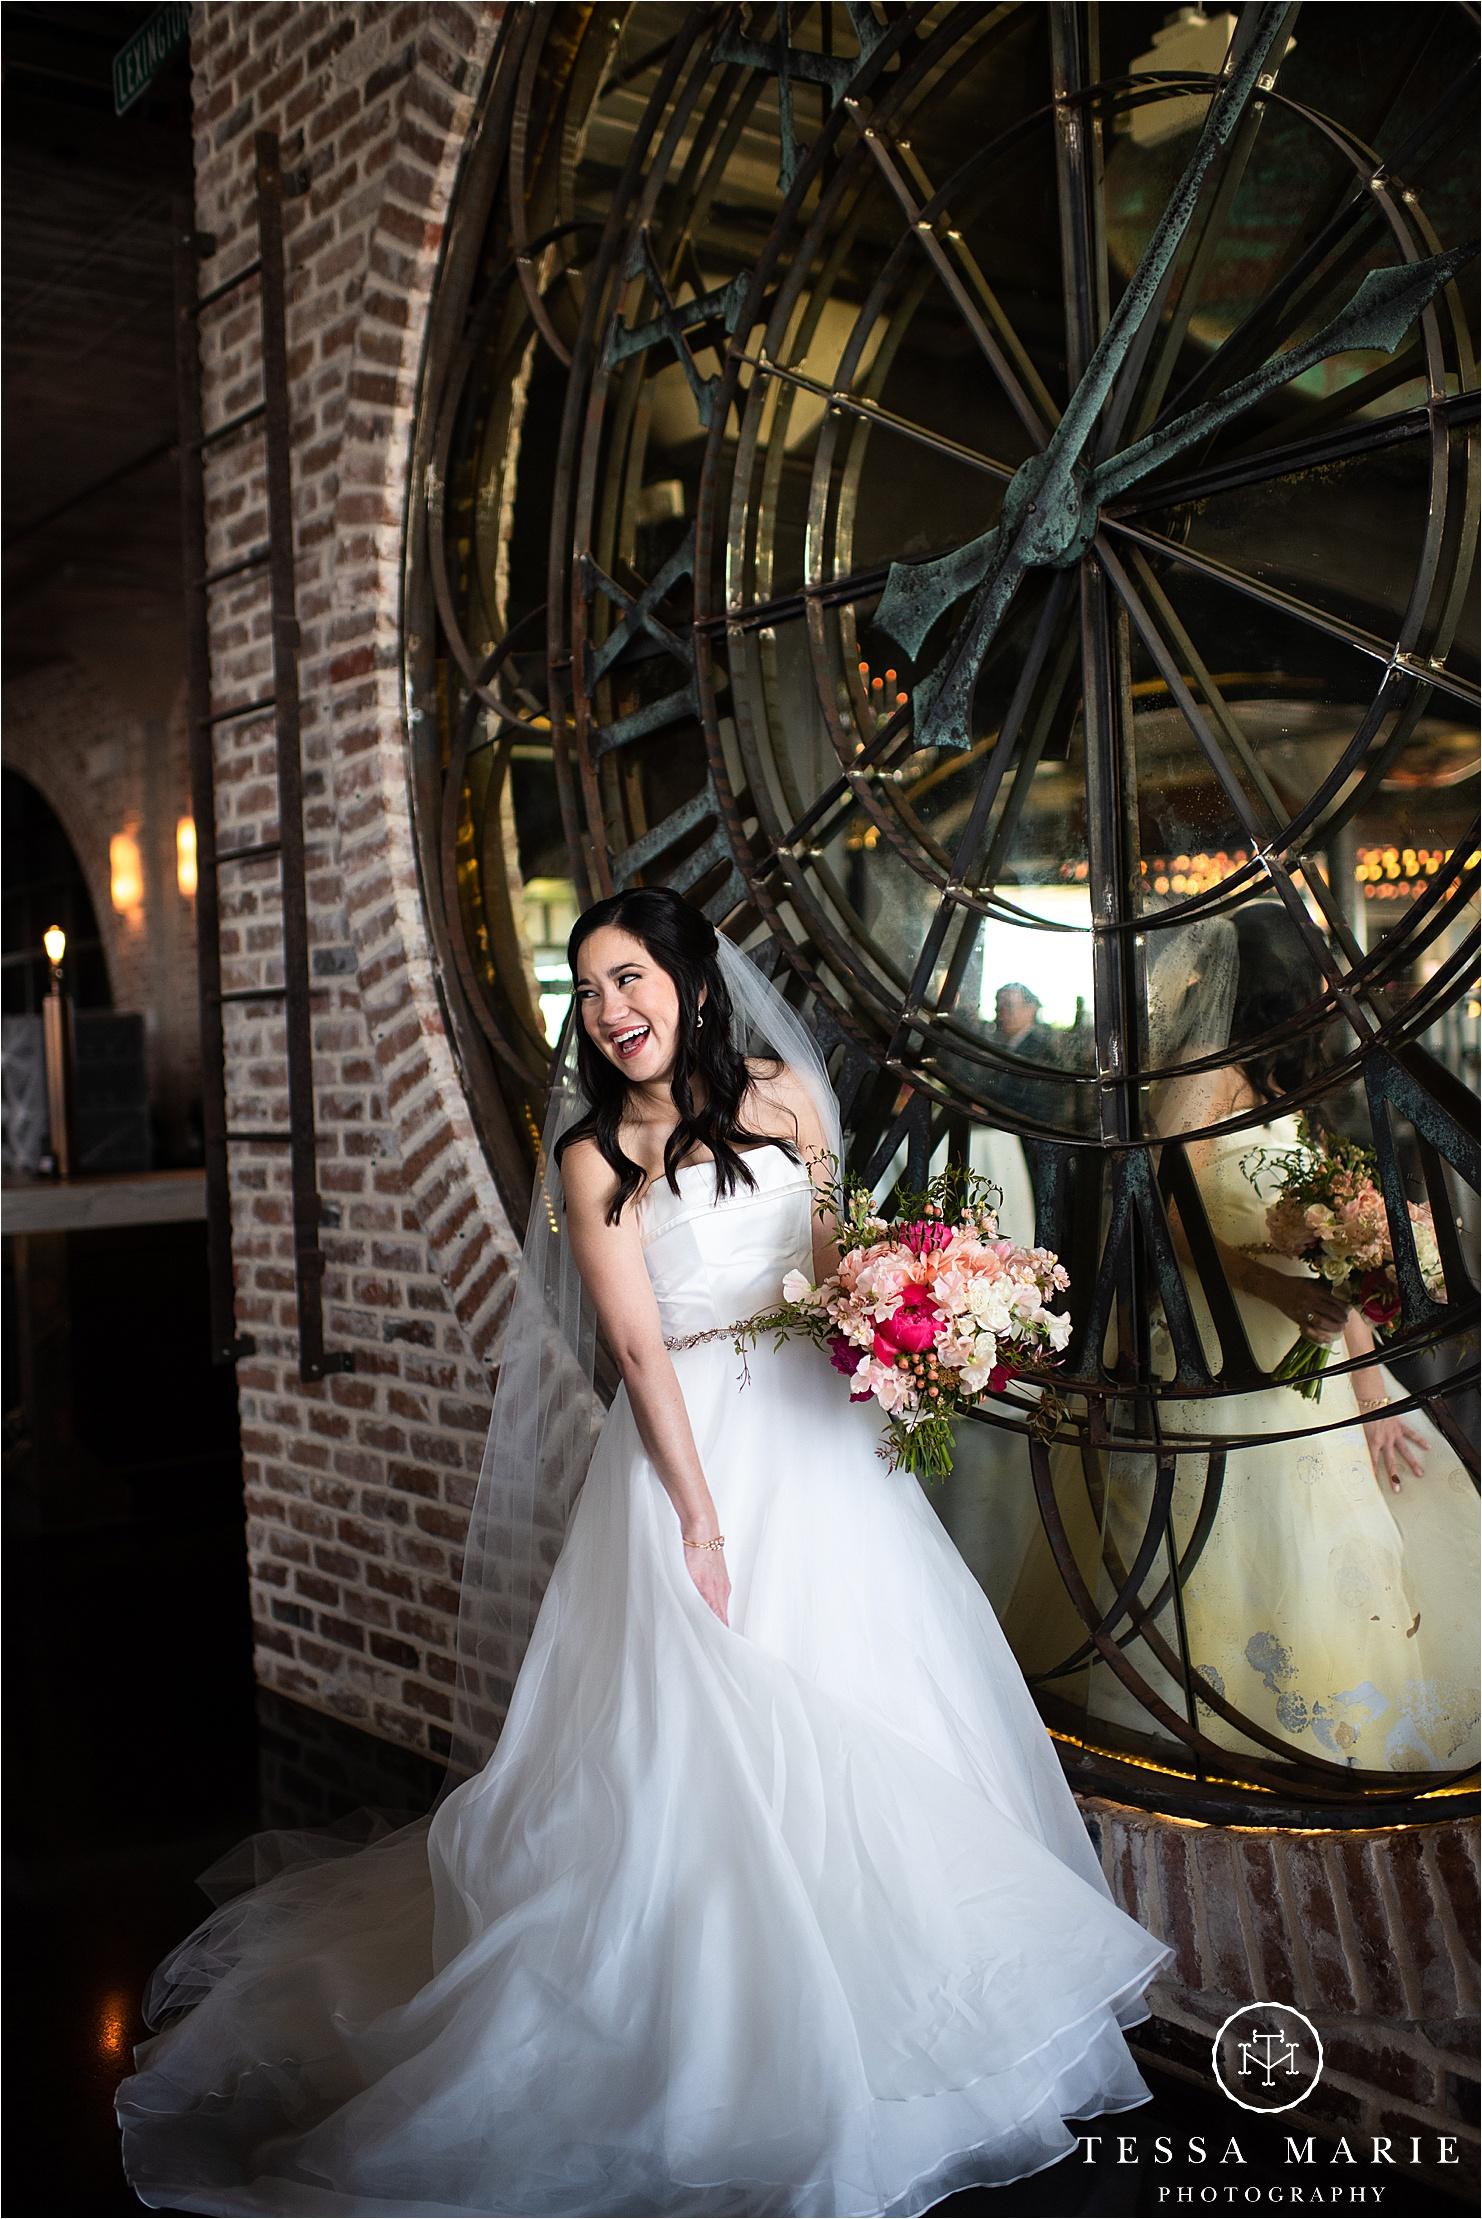 Tessa_marie_weddings_houston_wedding_photographer_The_astorian_0036.jpg